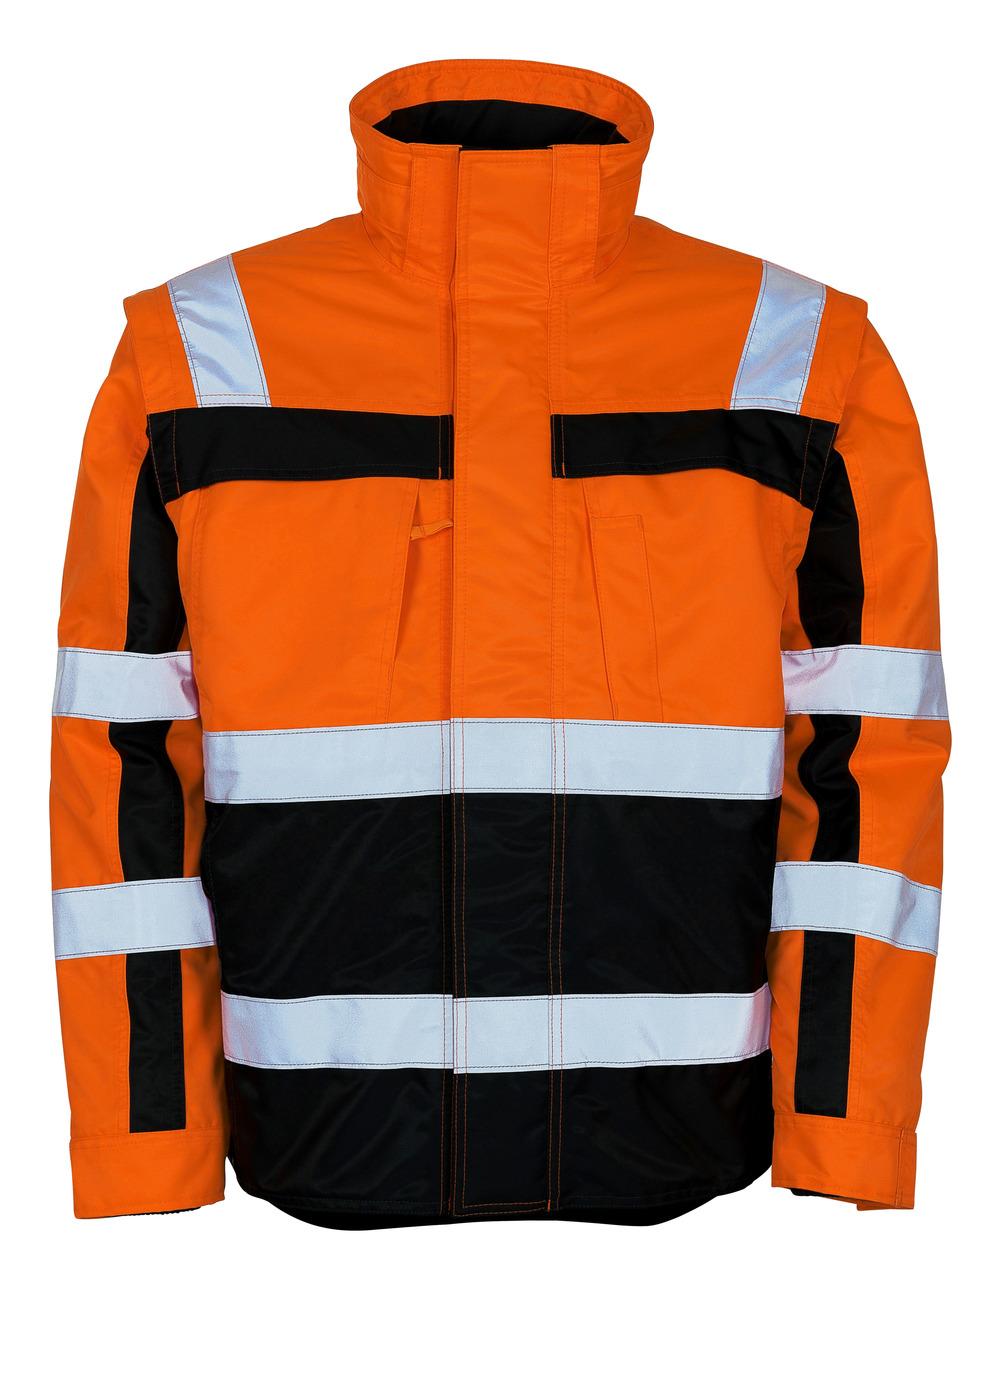 09335-880-141 Vinterjakke - hi-vis orange/marine